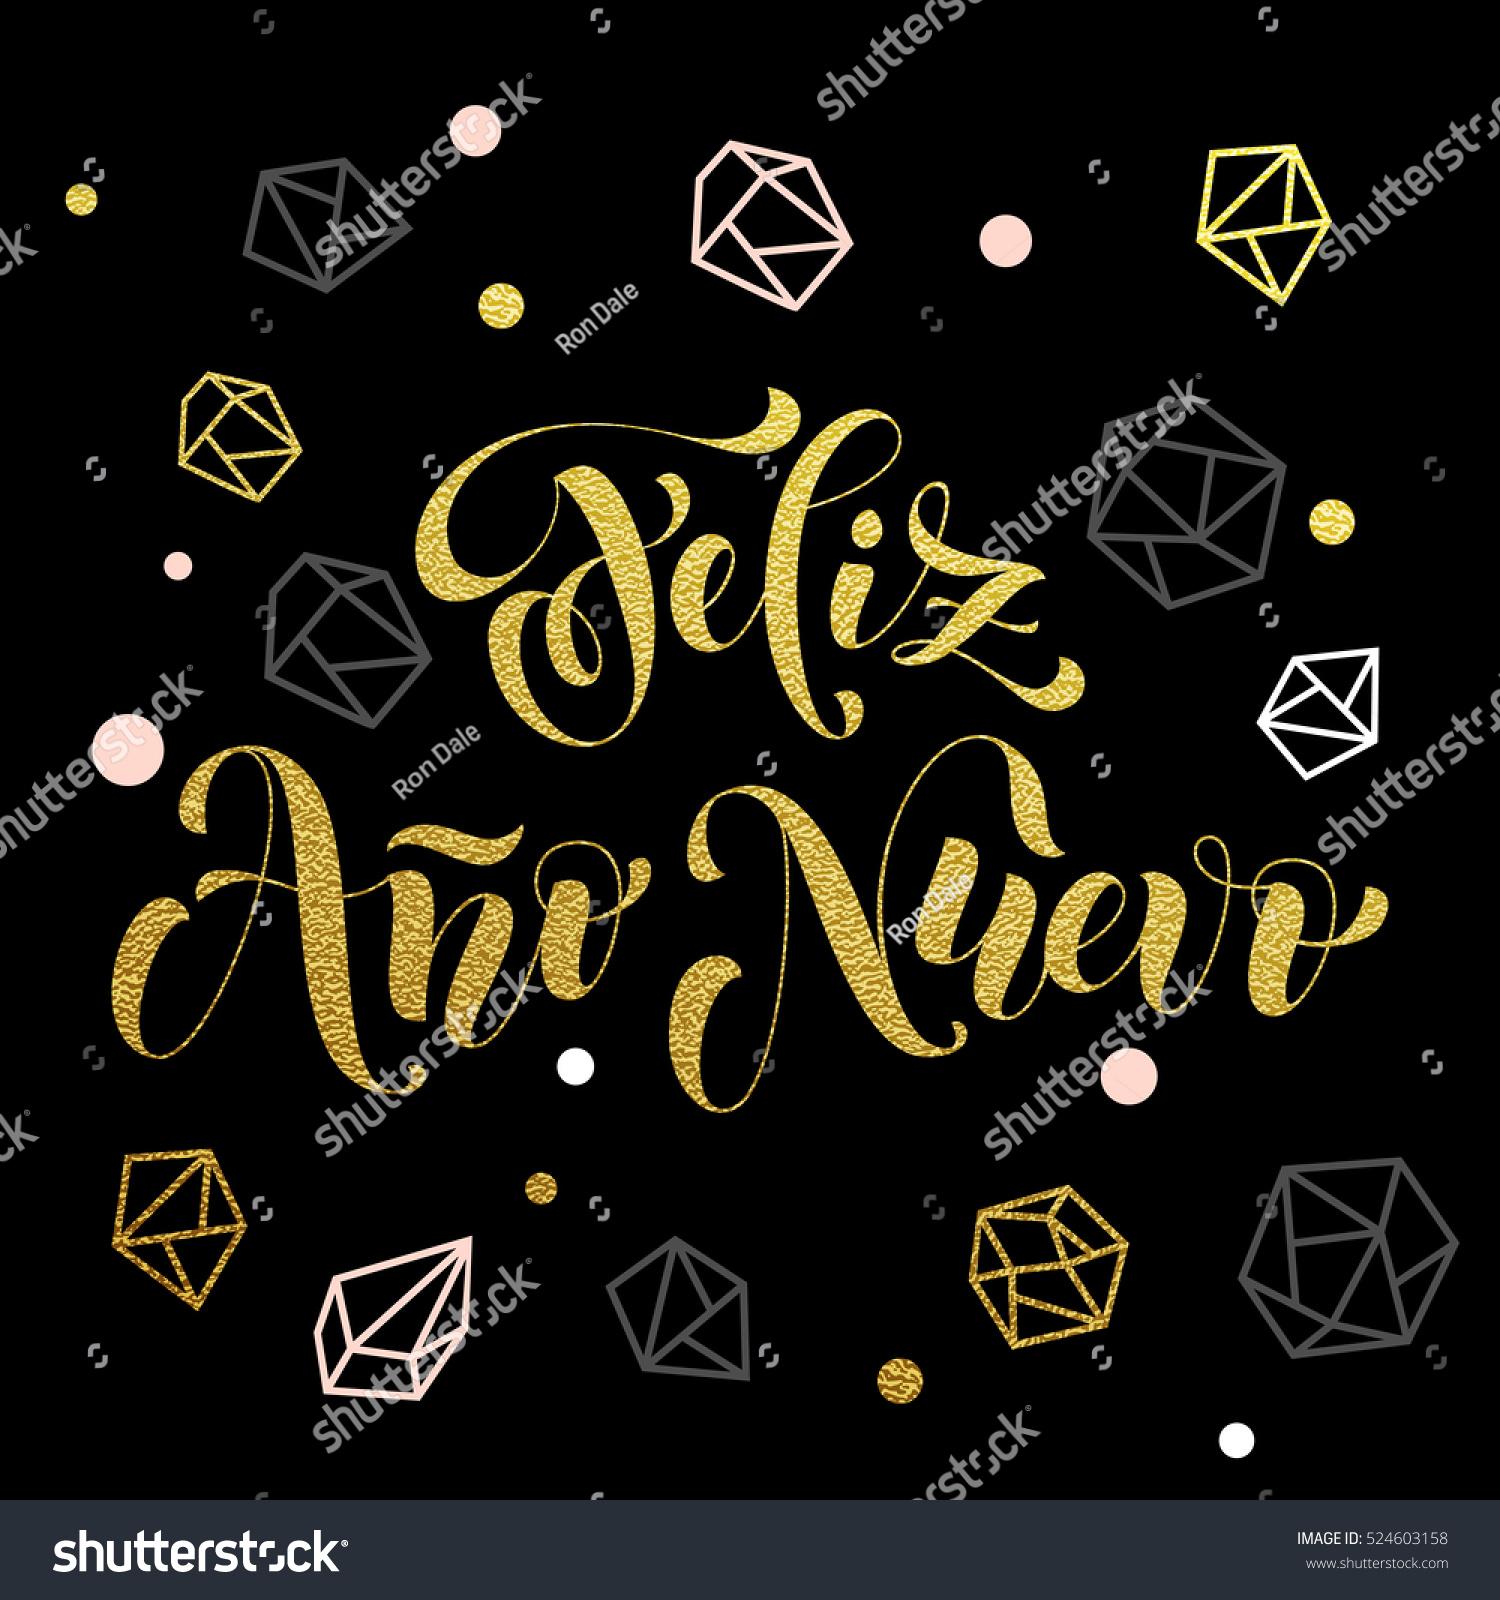 New Year Spanish Golden Text Feliz Stock Vector Royalty Free